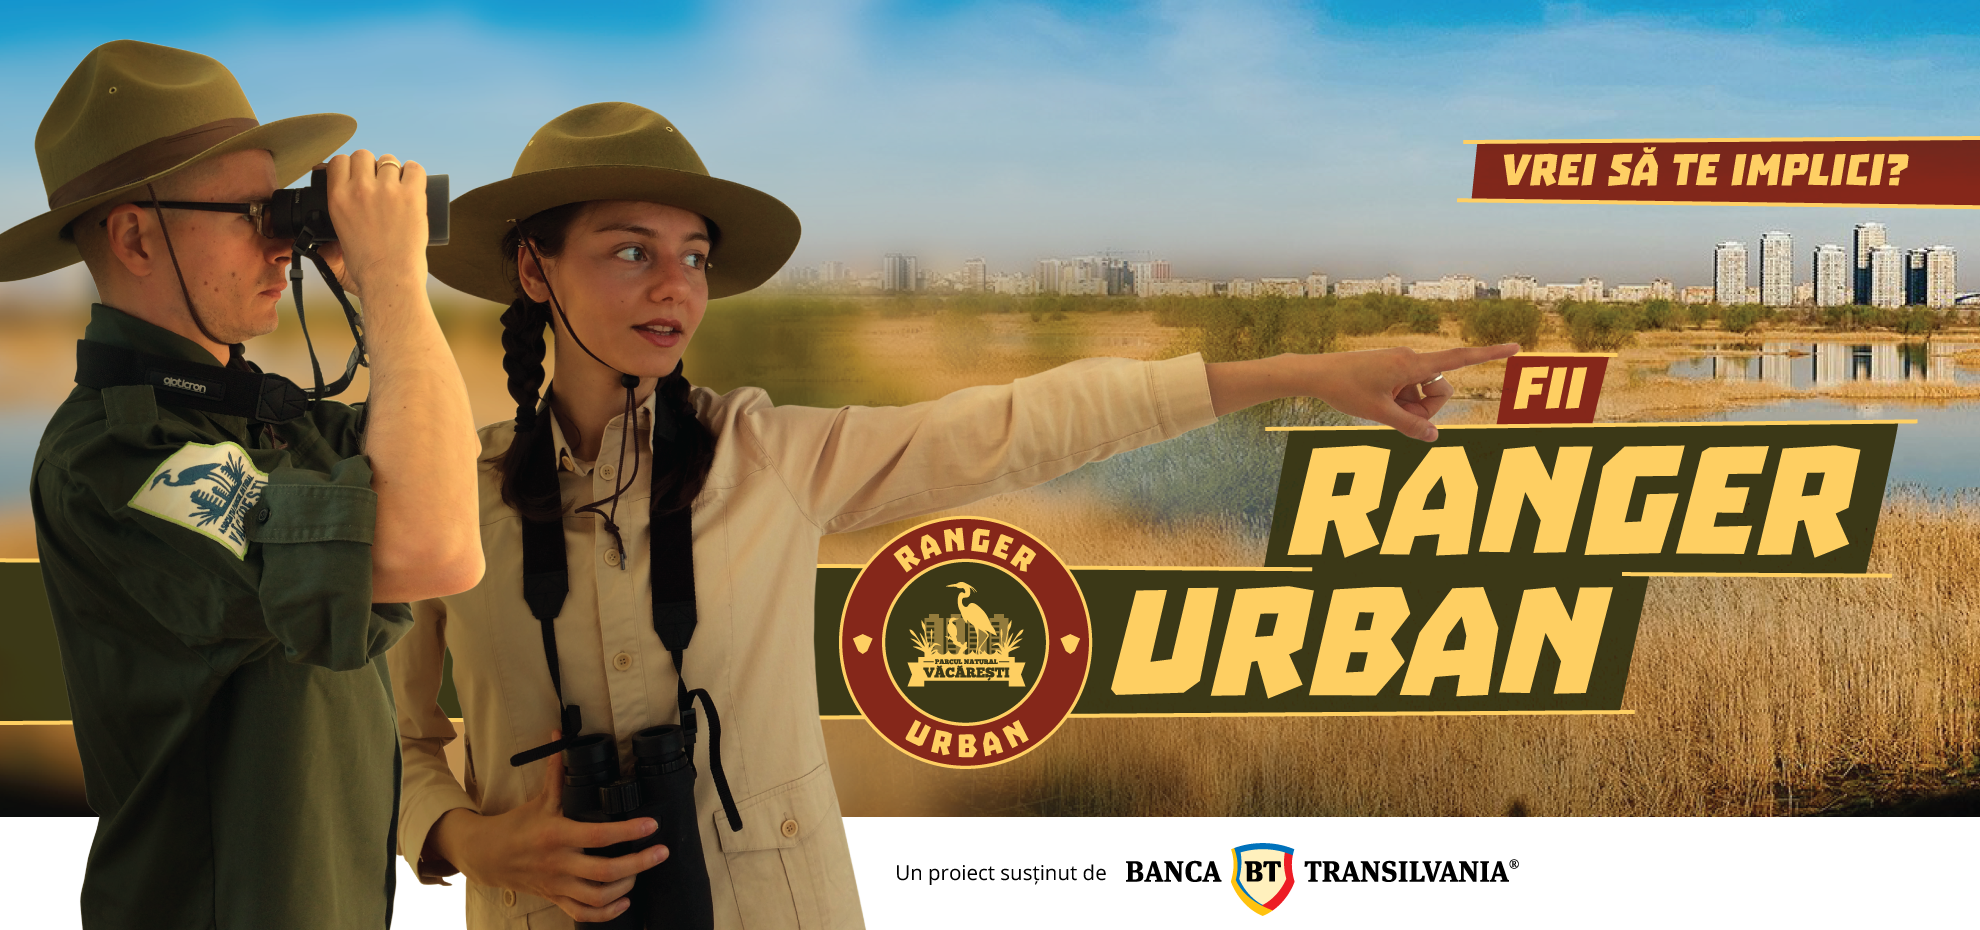 Ranger Urban